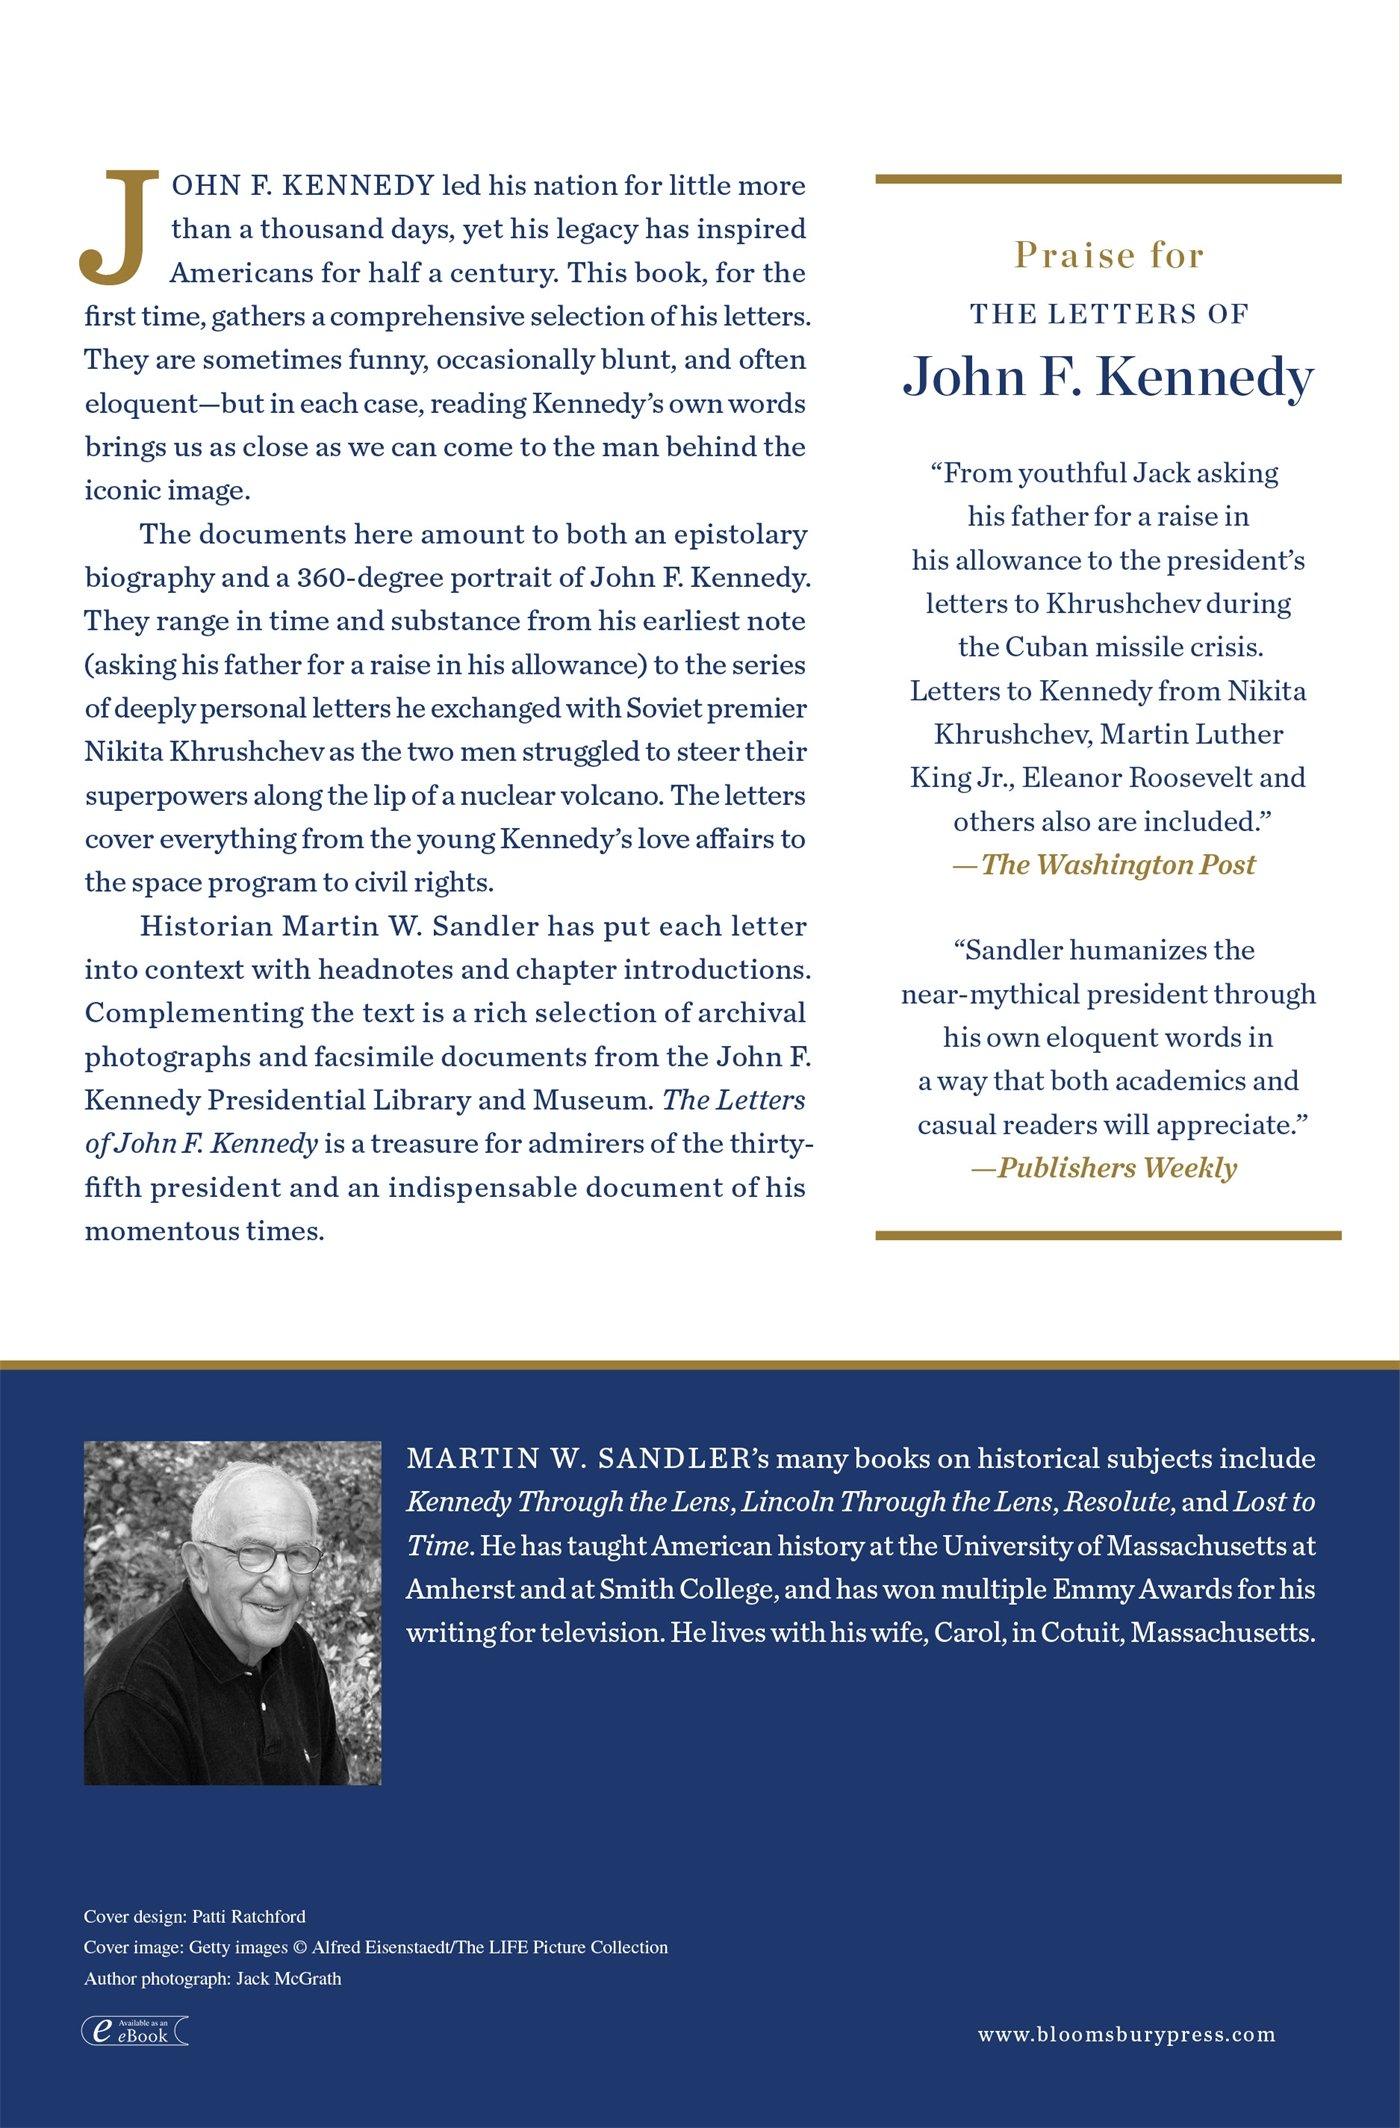 Amazon: The Letters Of John F Kennedy (9781608193523): John F Kennedy,  Martin W Sandler: Books